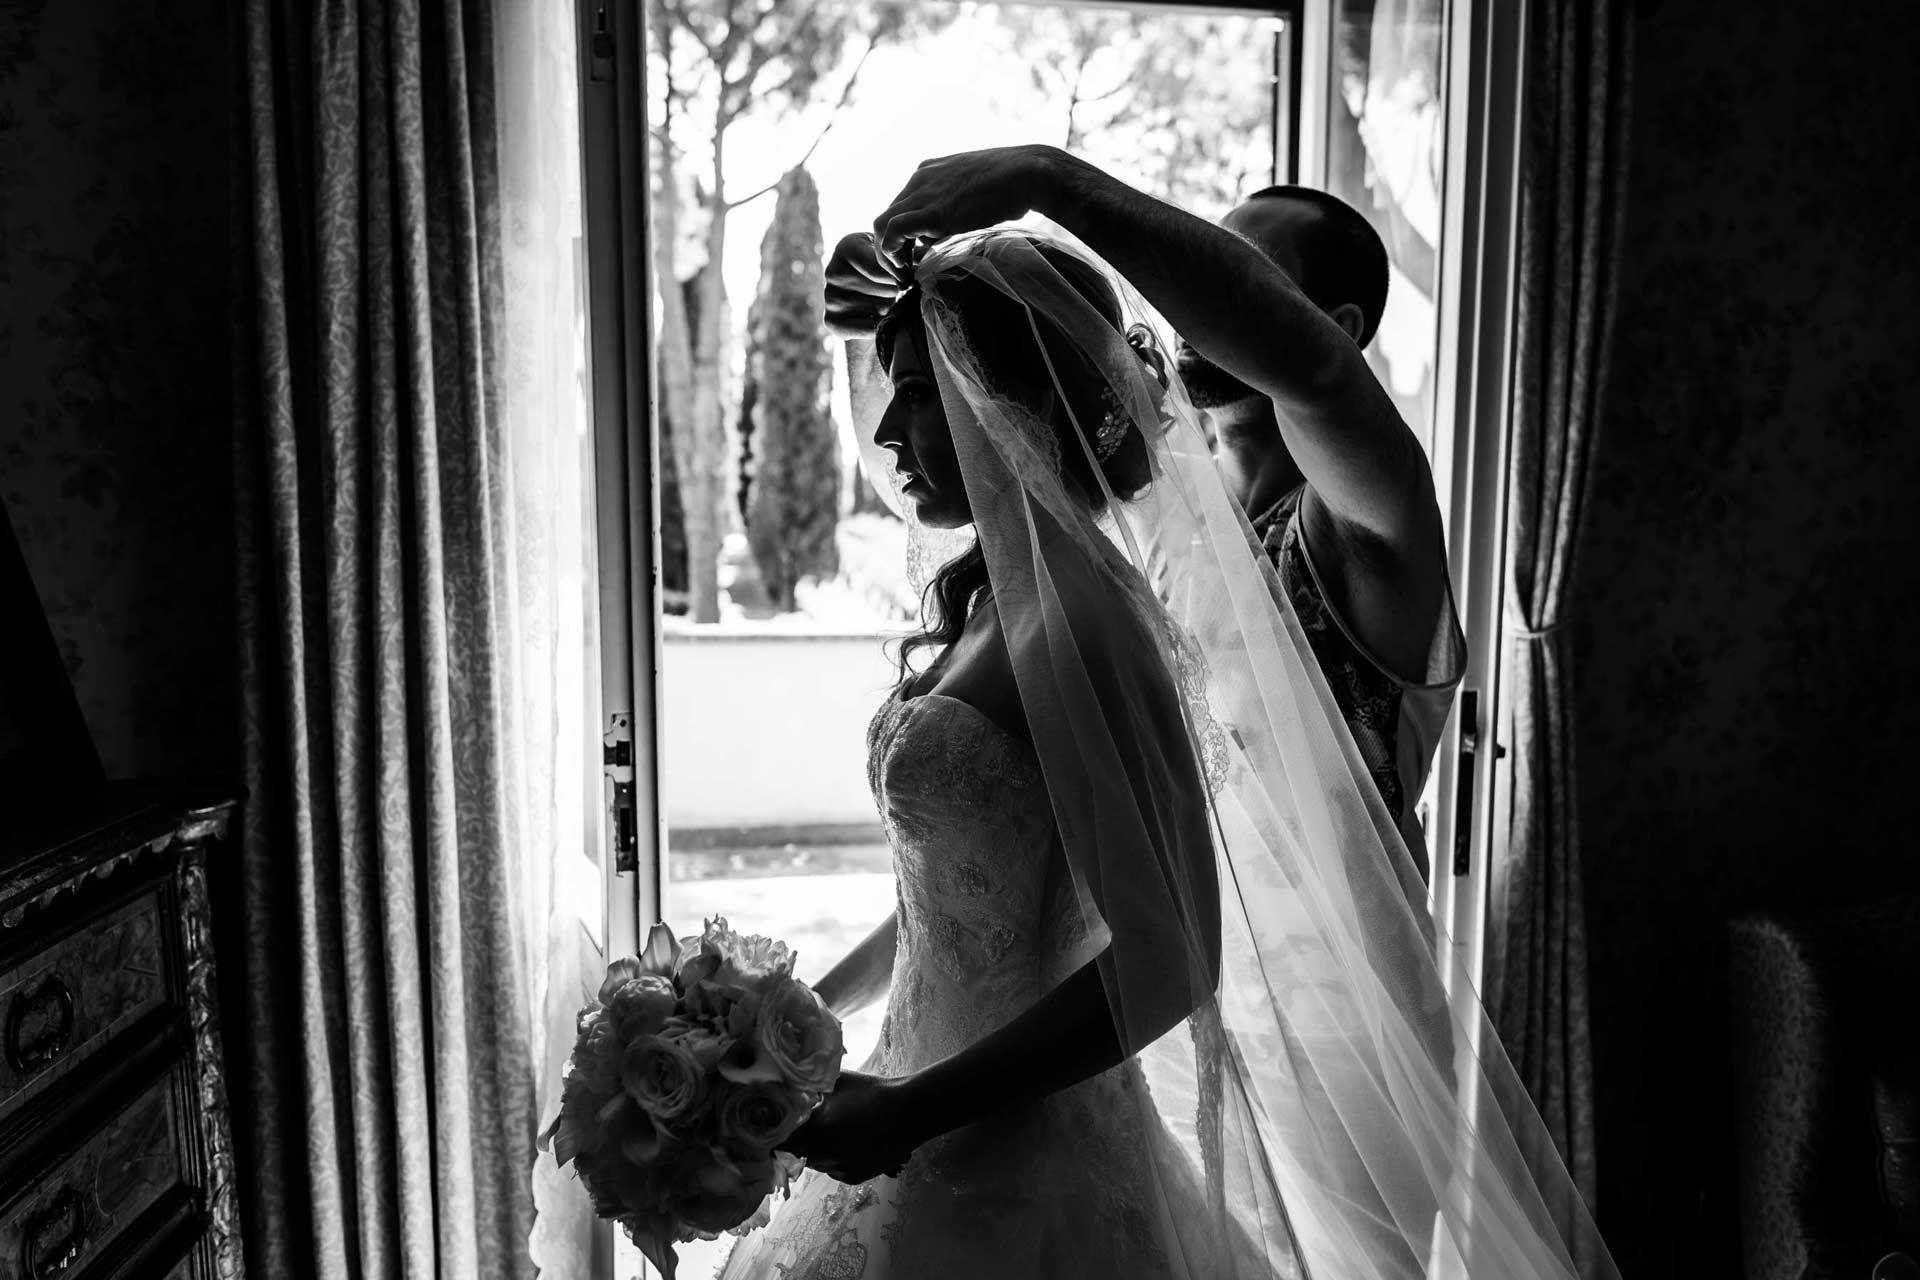 Fotografo-Matrimoni-Stile-Reportage-Simone-Nunzi